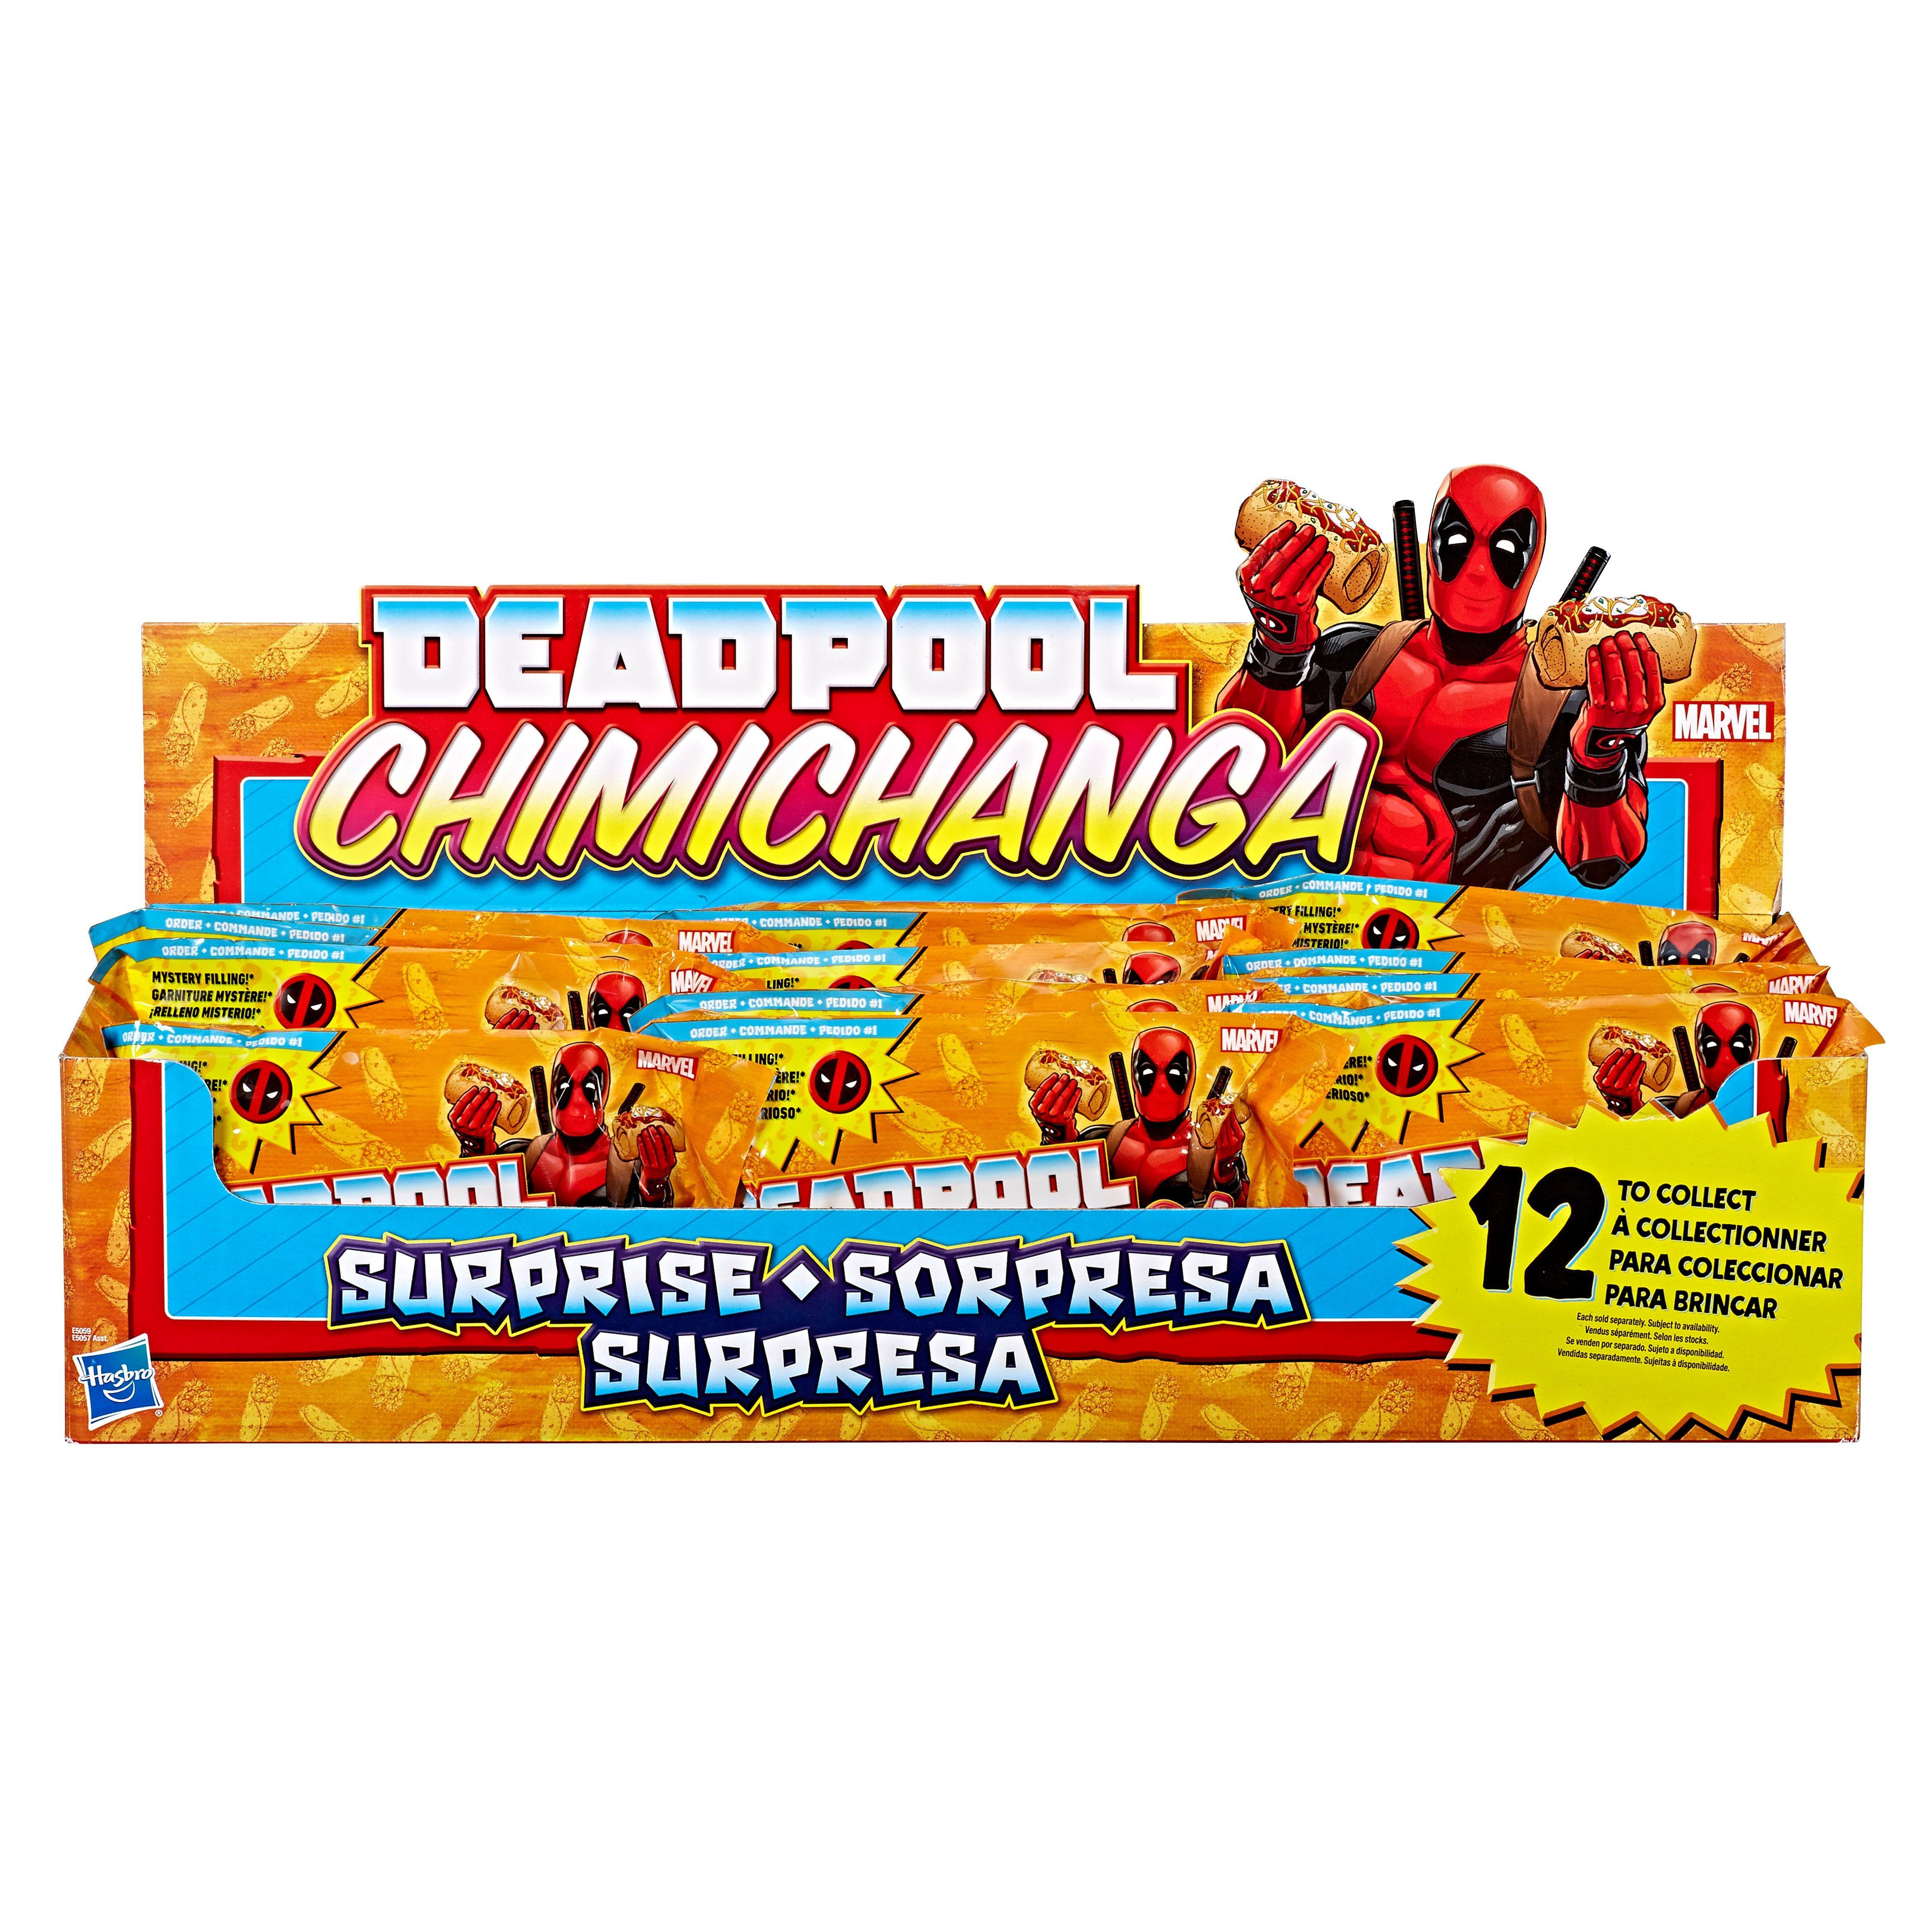 Deadpool Chimichanga Surprise Mystery Pack Marvel Mini Figures 12 Pack